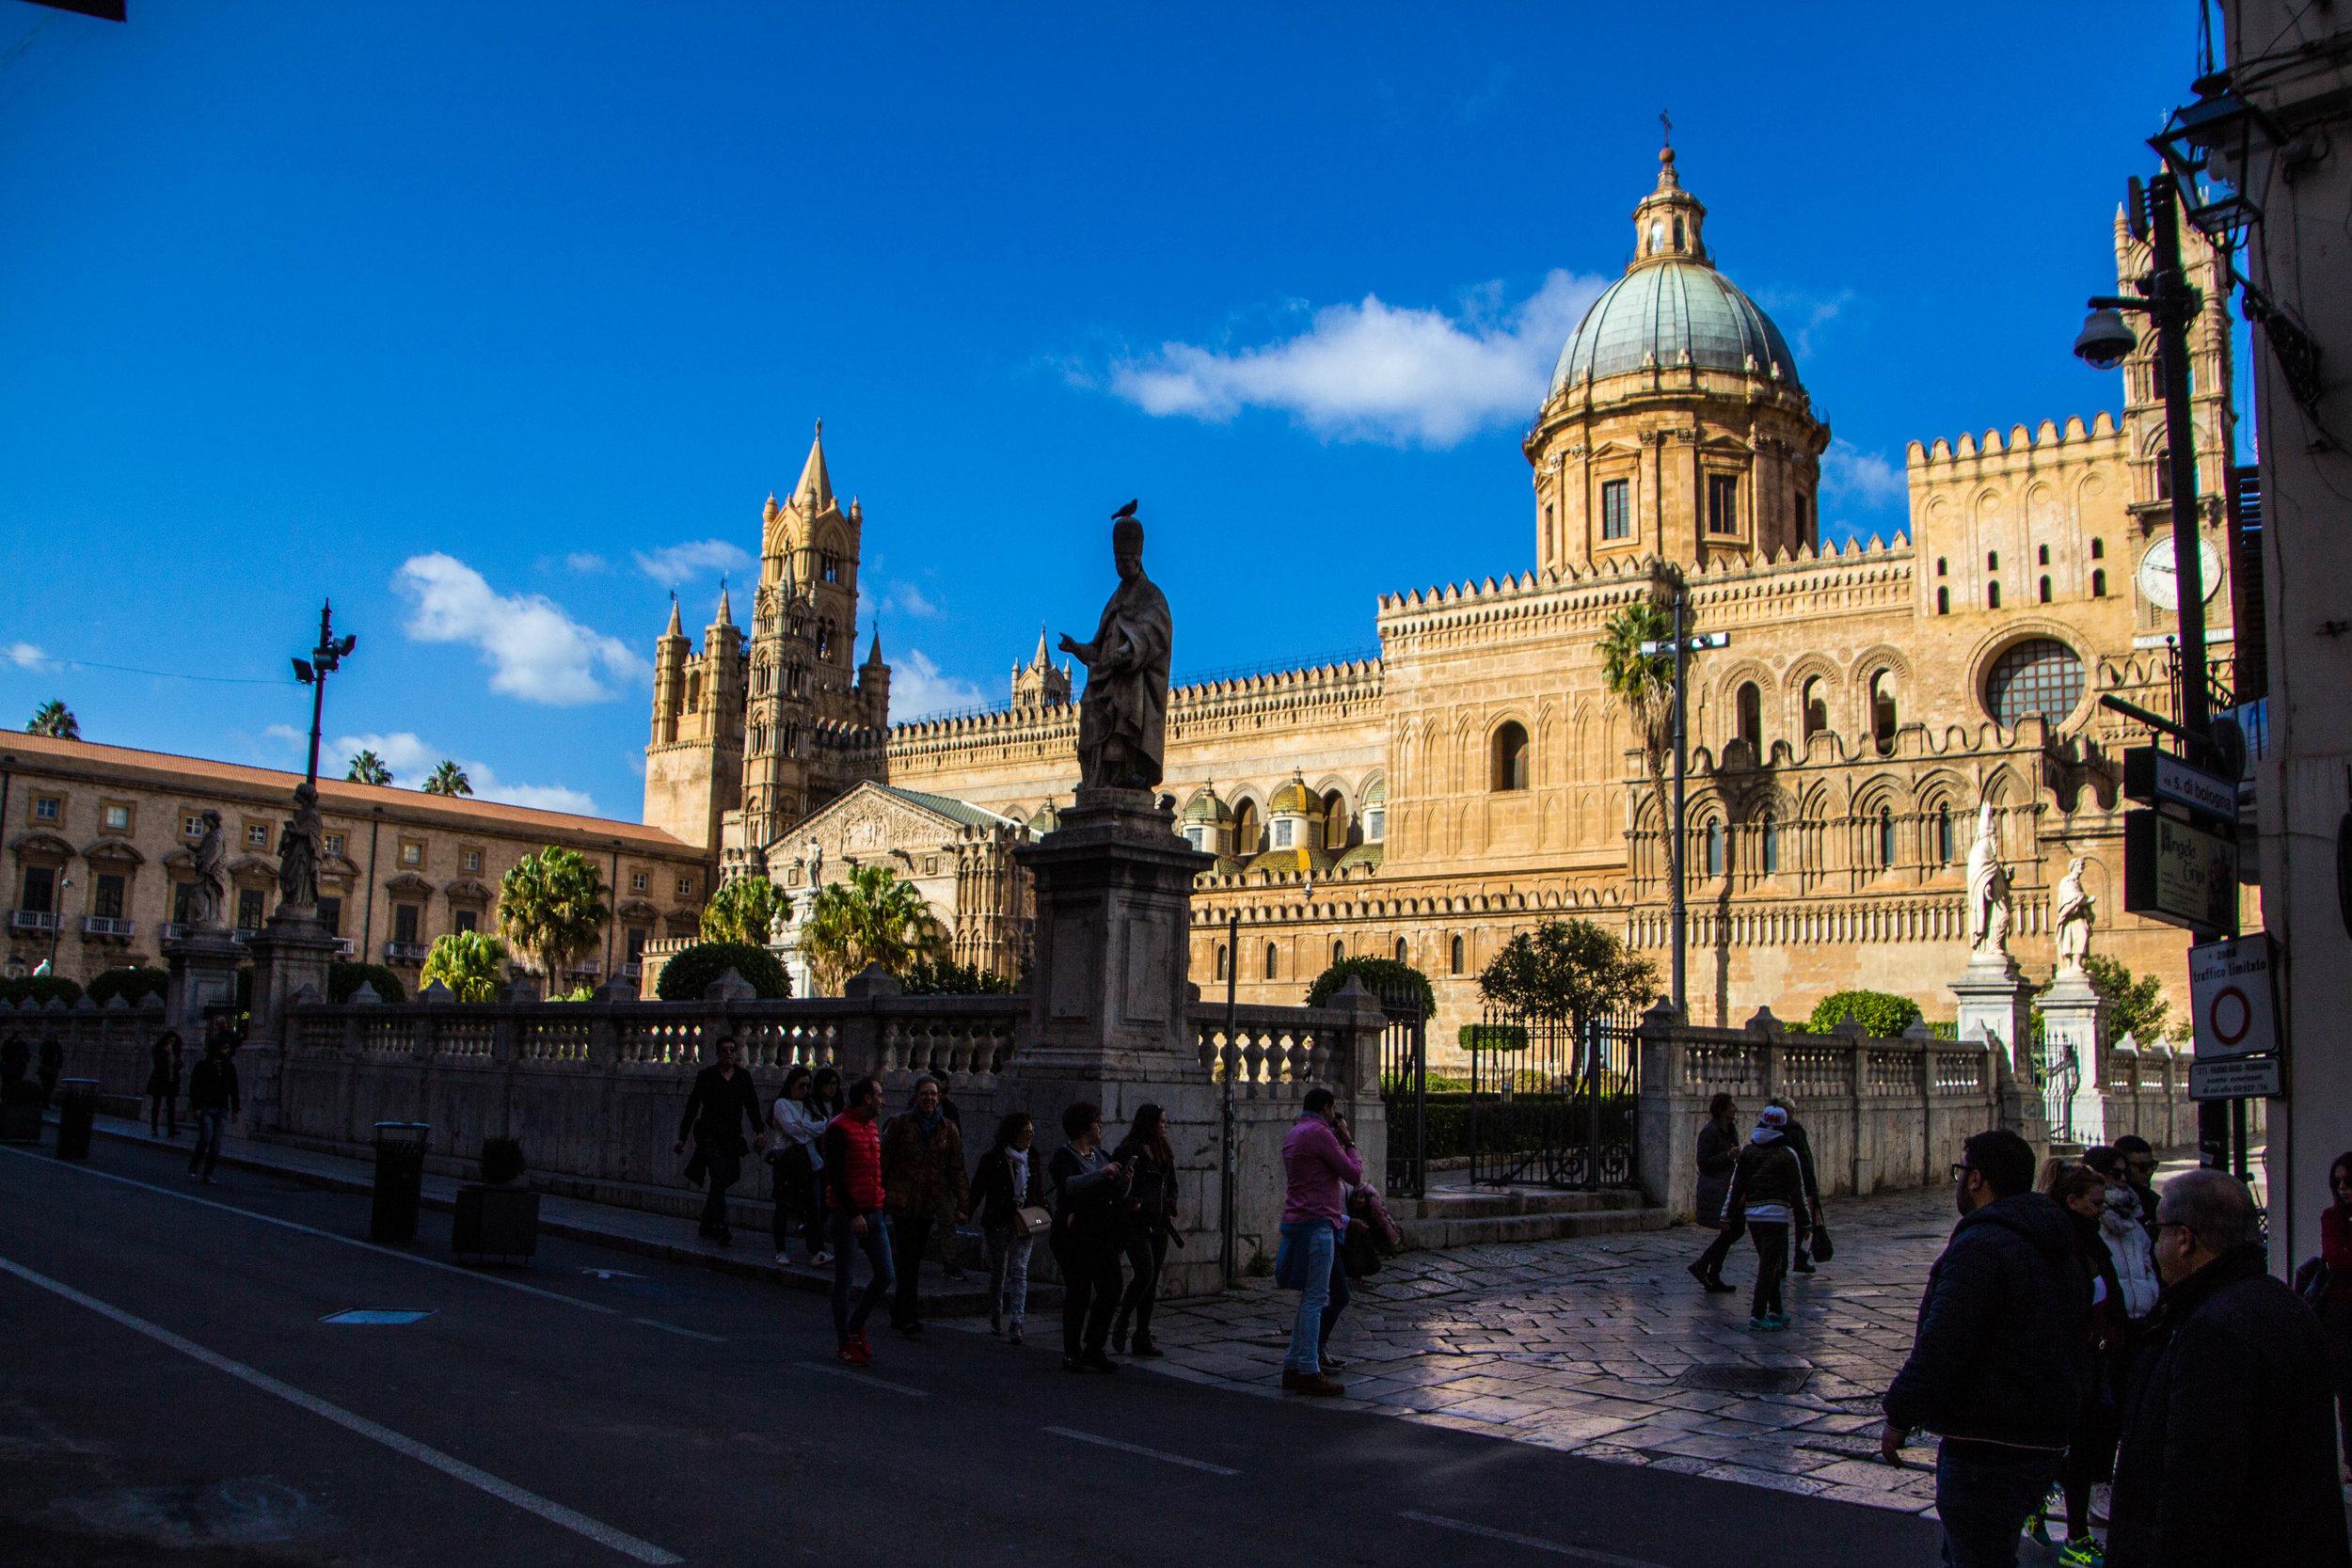 cattedrale-santa-vergine-maria-palermo-sicily -1.jpg